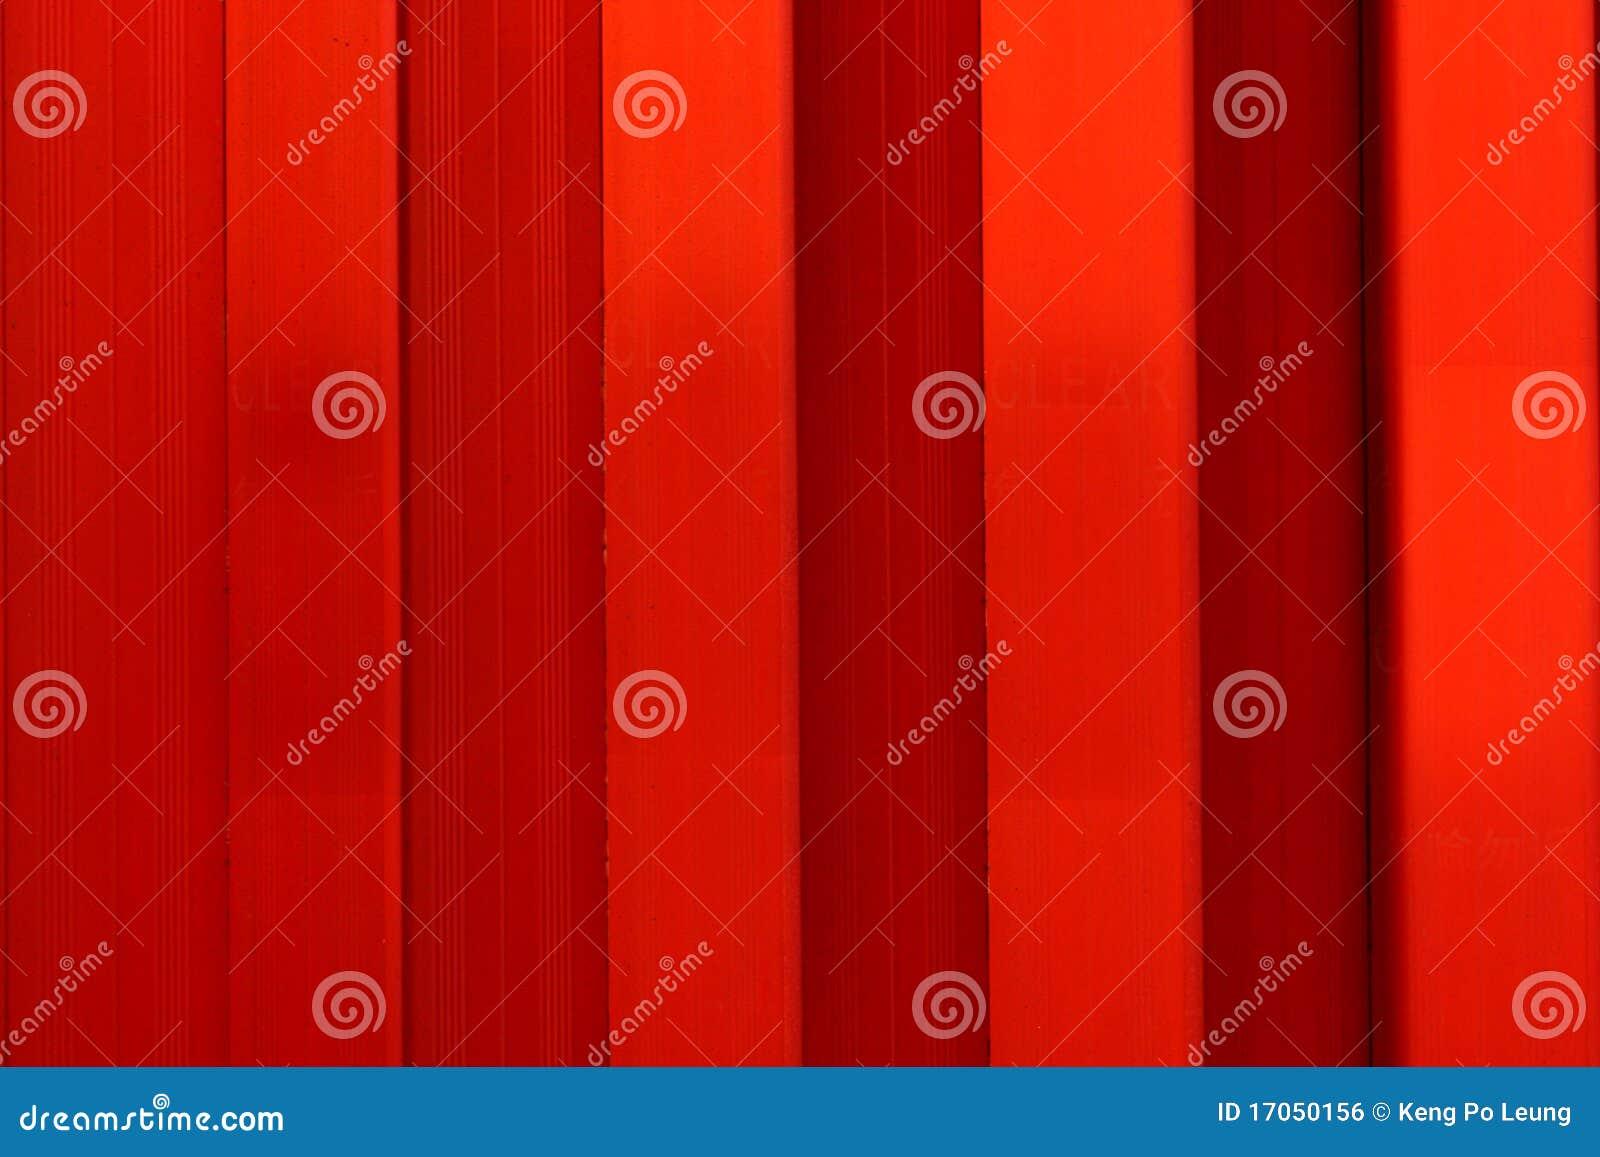 Parete Rossa Immagine Stock Libera da Diritti - Immagine: 17050156